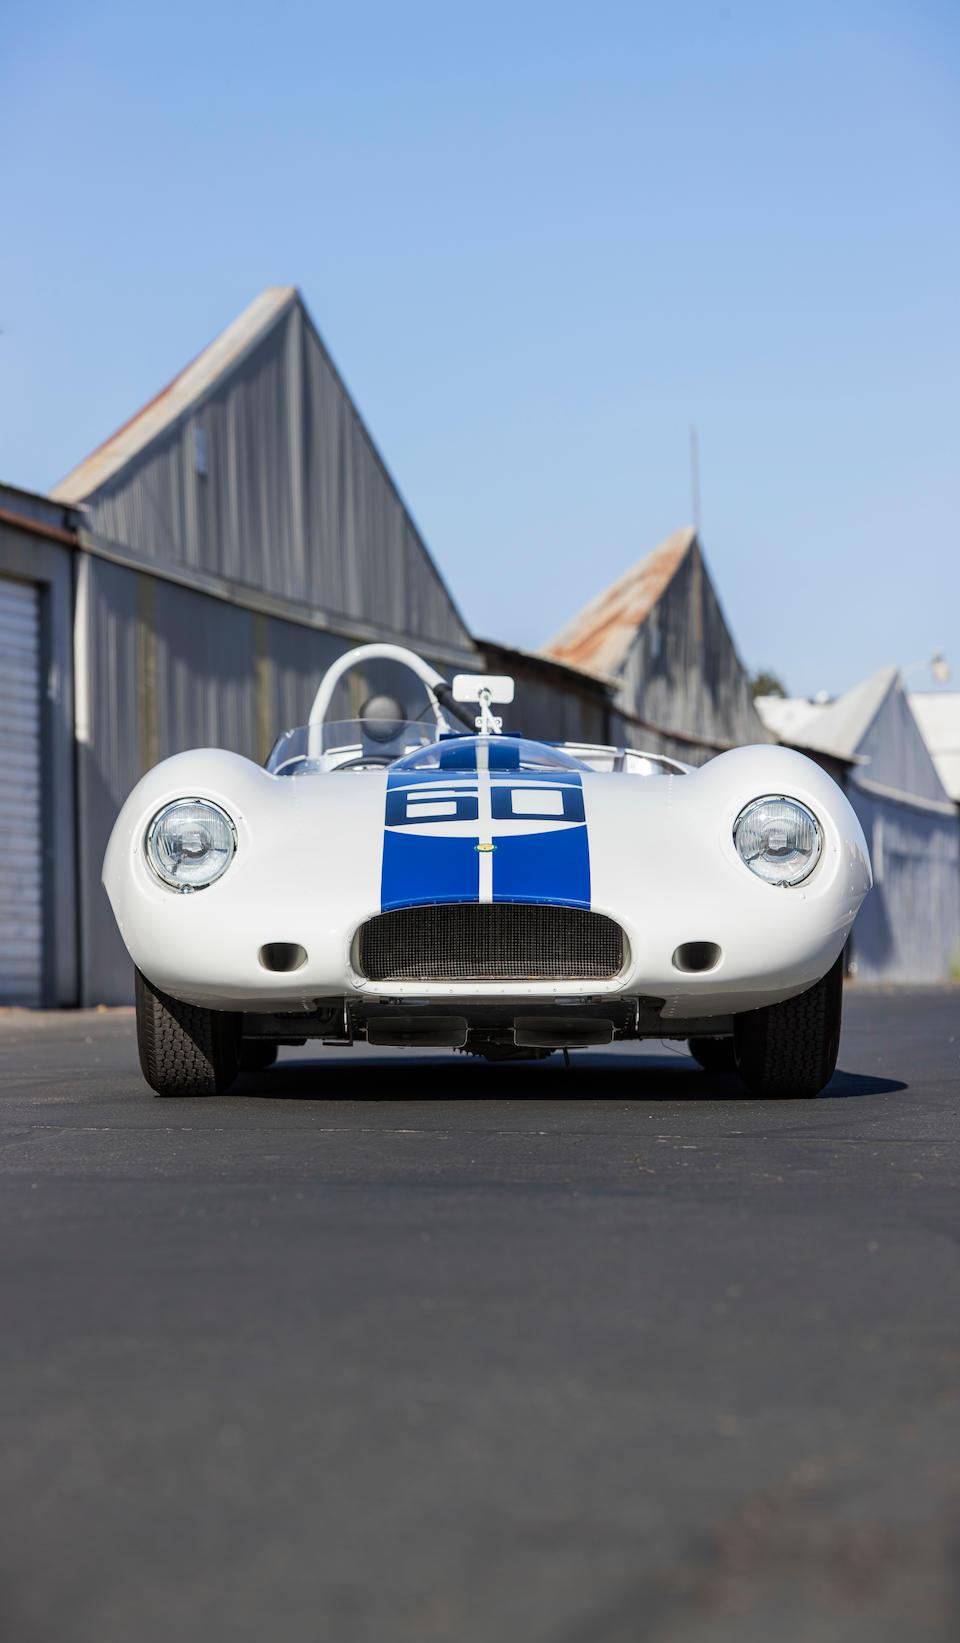 <b>1959 Lister-Jaguar Sports Racer</b><br />Chassis no. BHL 123<br />Engine no. LB2118-8